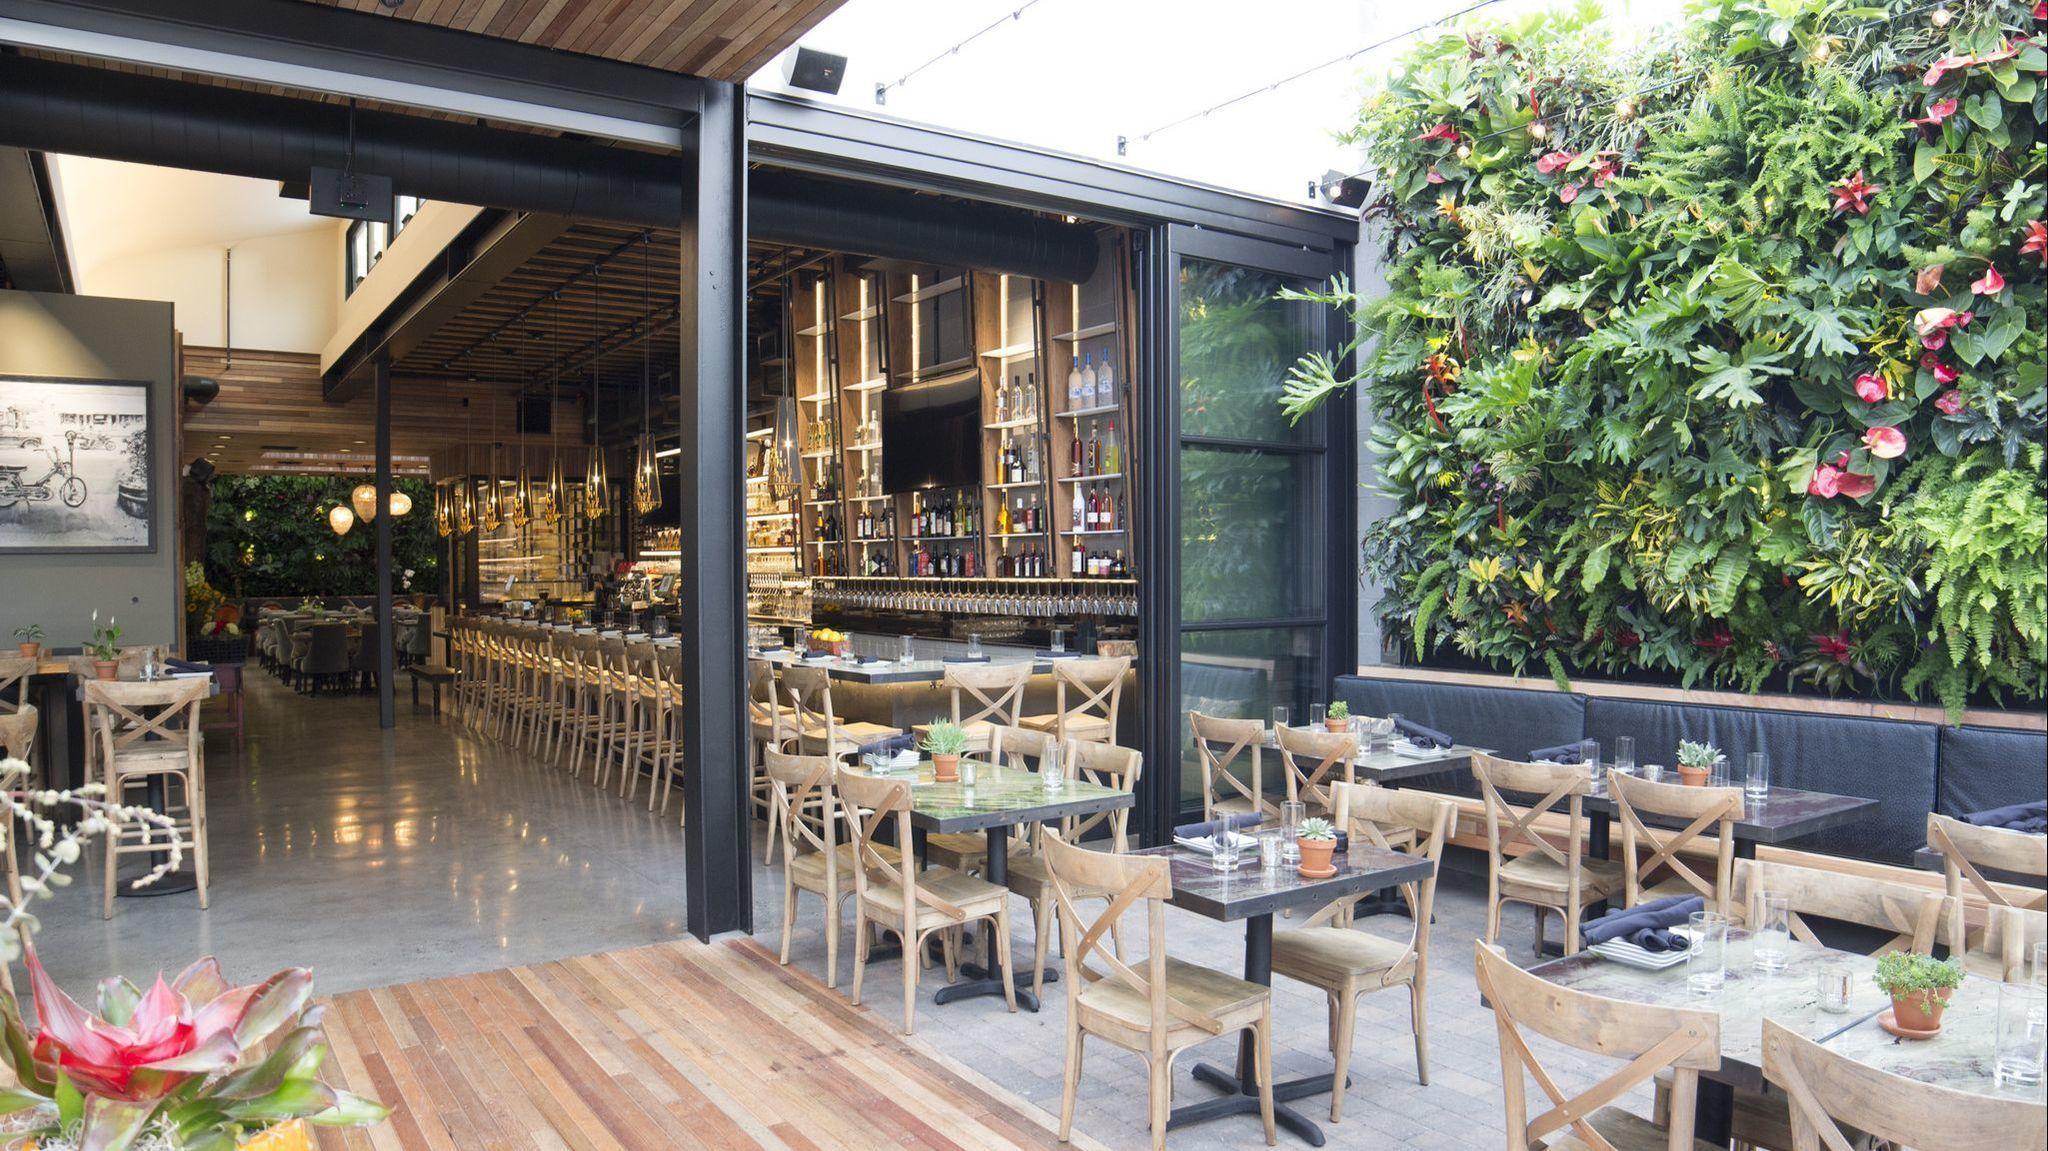 patio restaurants expanding their brand to north county the san diego union tribune - Restaurant Patio